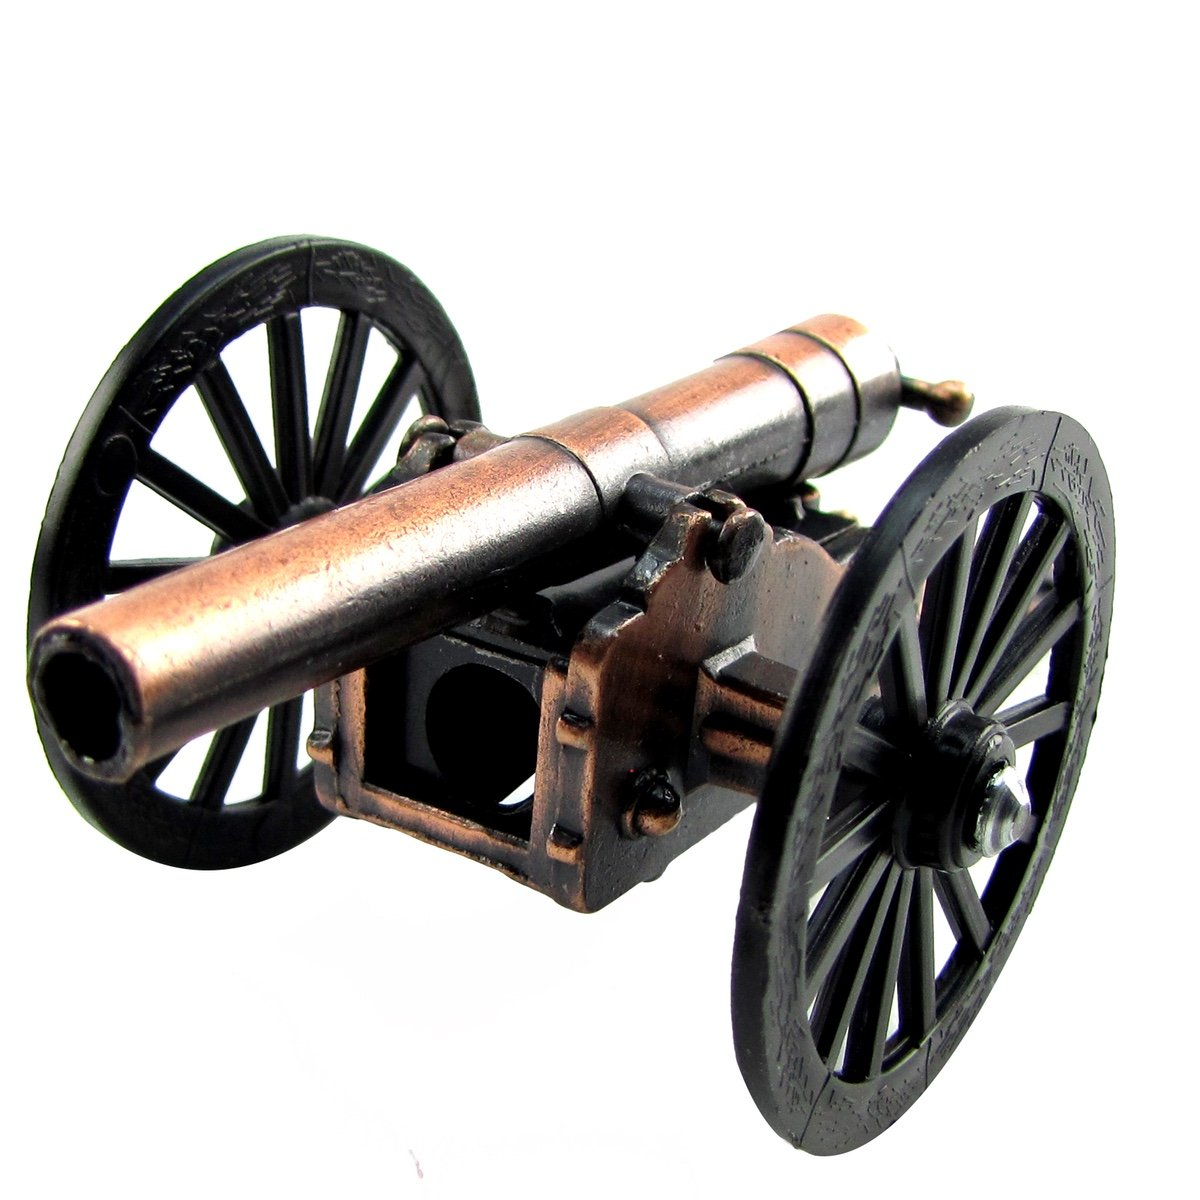 Civil War Cannon Die Cast Miniature Replica Pencil Sharpener Diecast Collectible TreasureGurus LLC